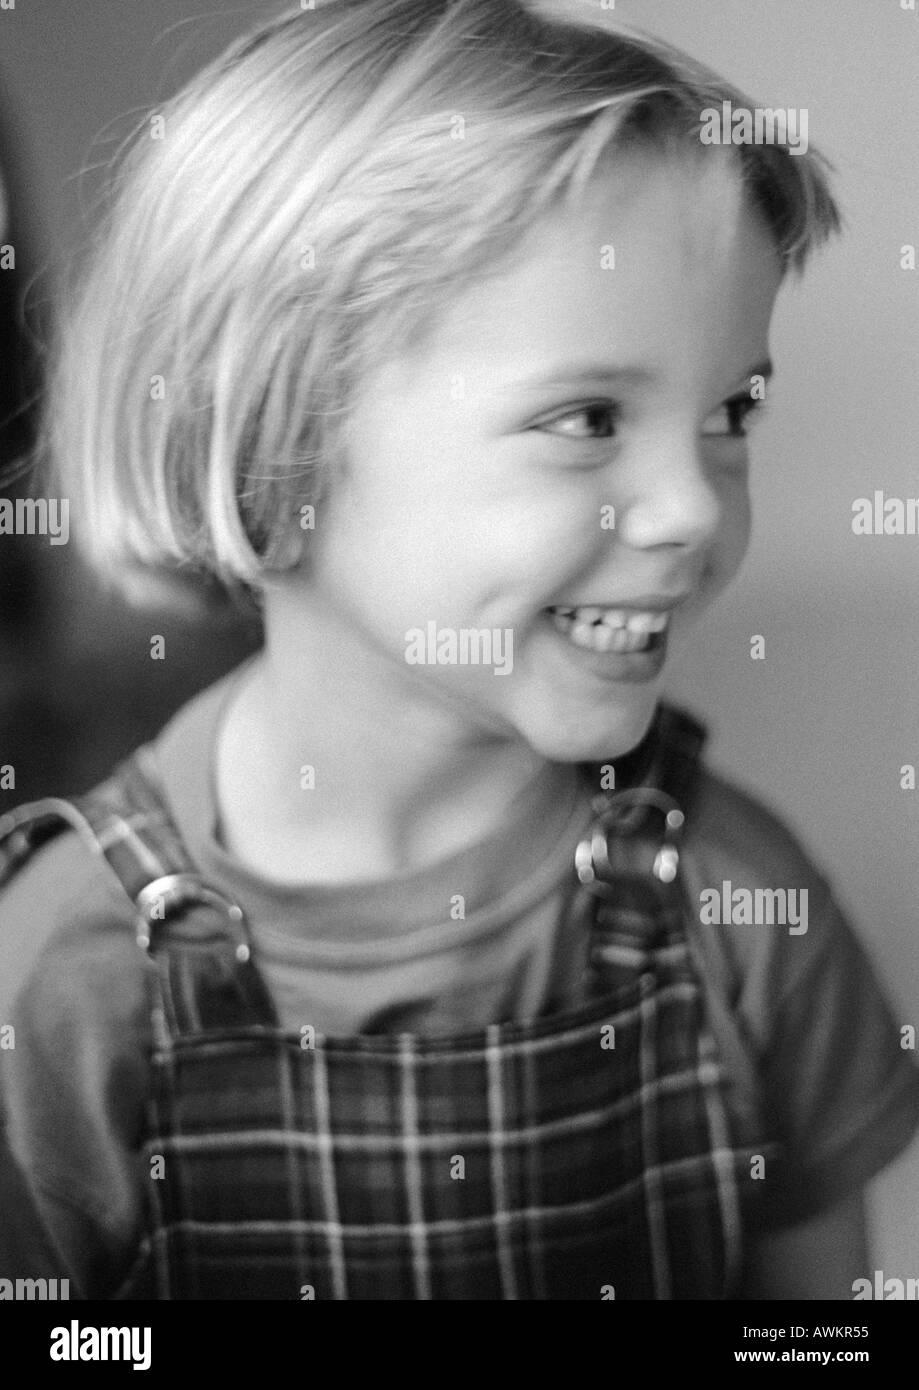 Little girl smiling, looking away, portrait, b&w - Stock Image